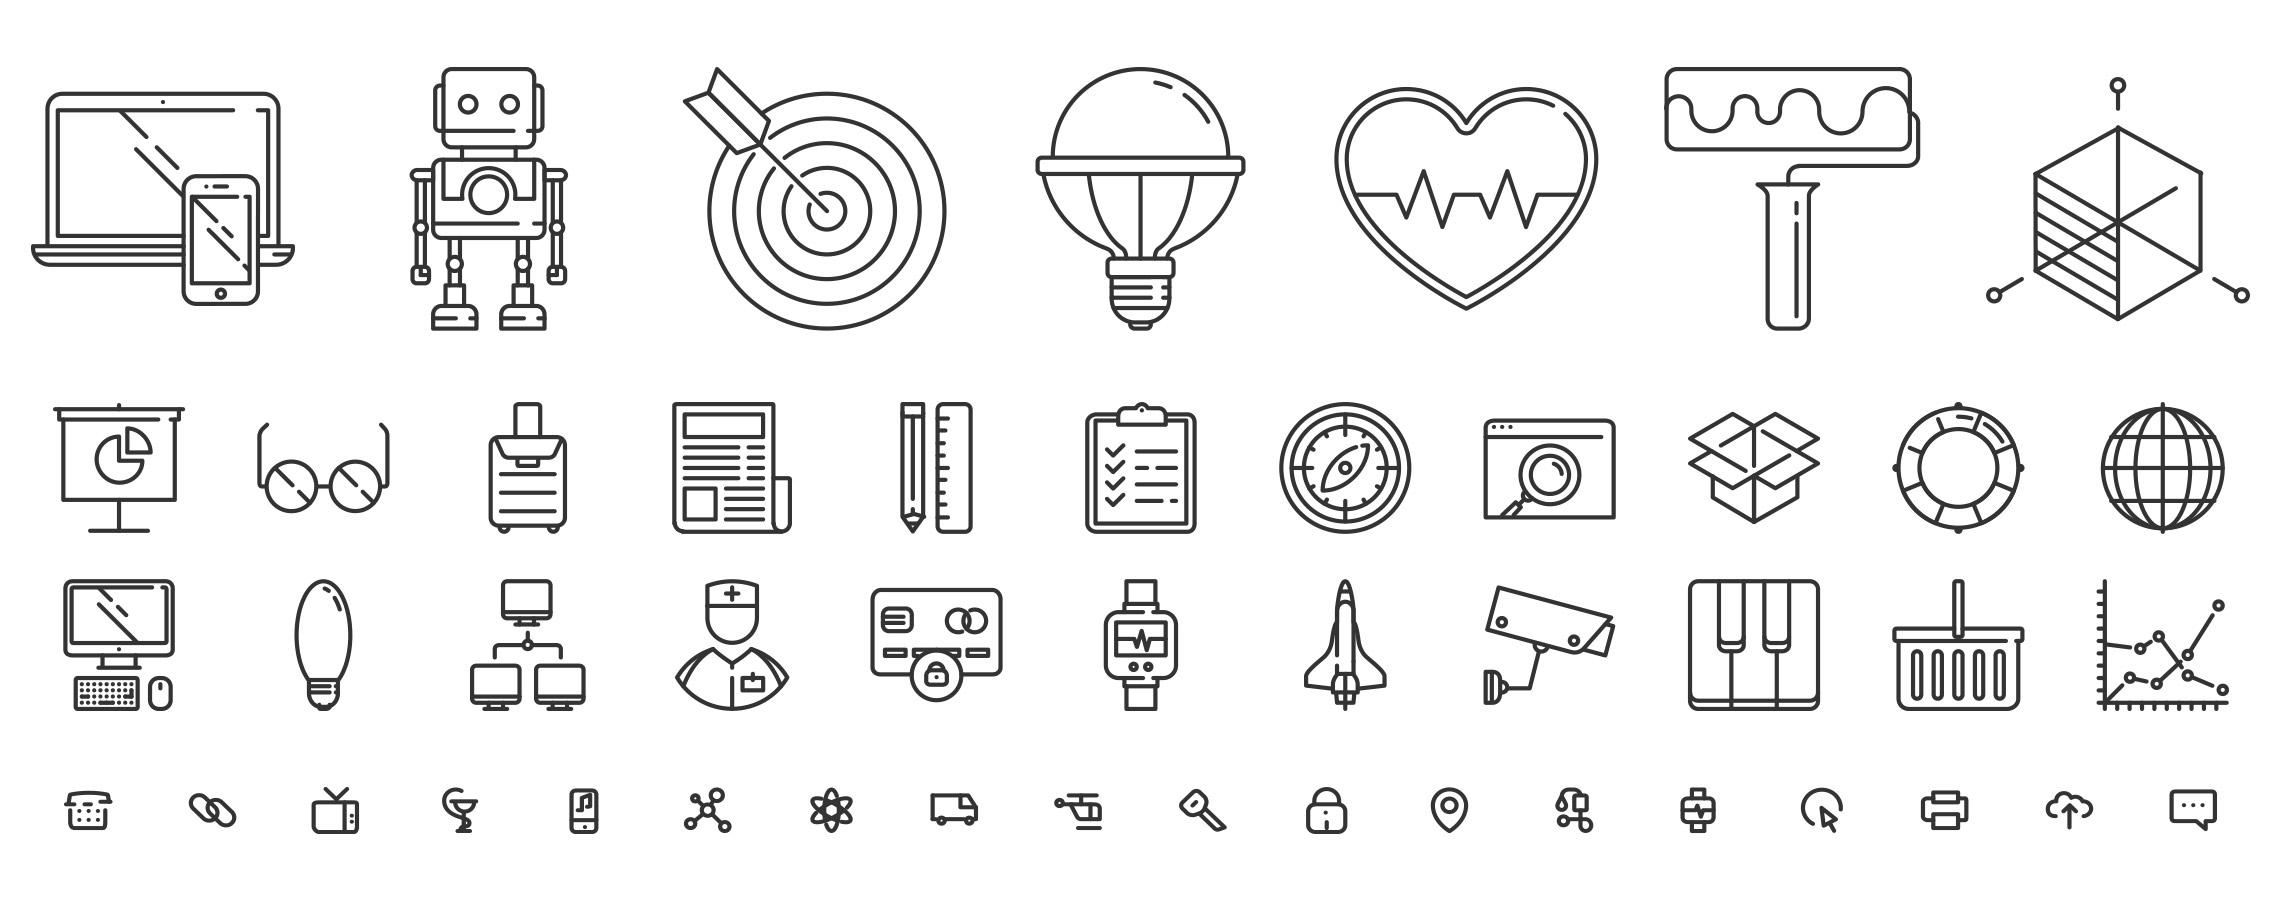 responsive icons vectors